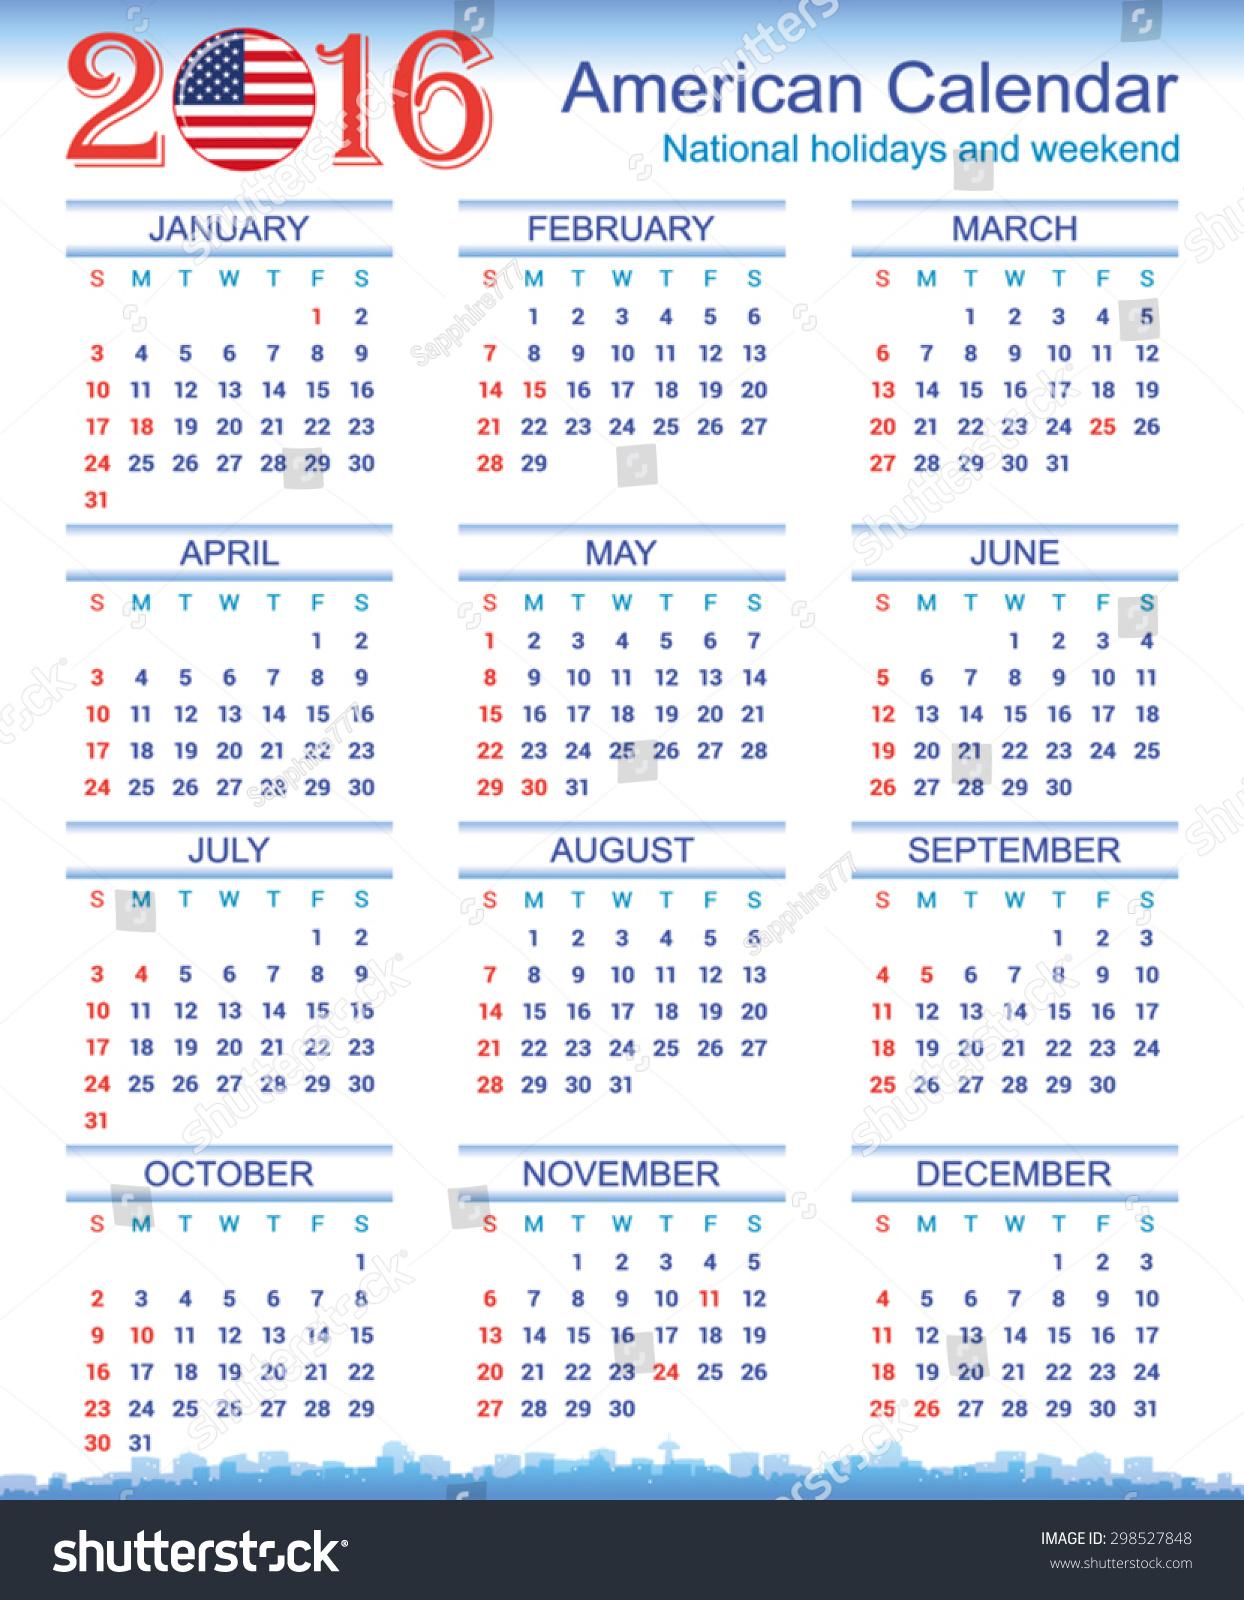 2016 American Calendar Stock Vector 298527848 - Shutterstock